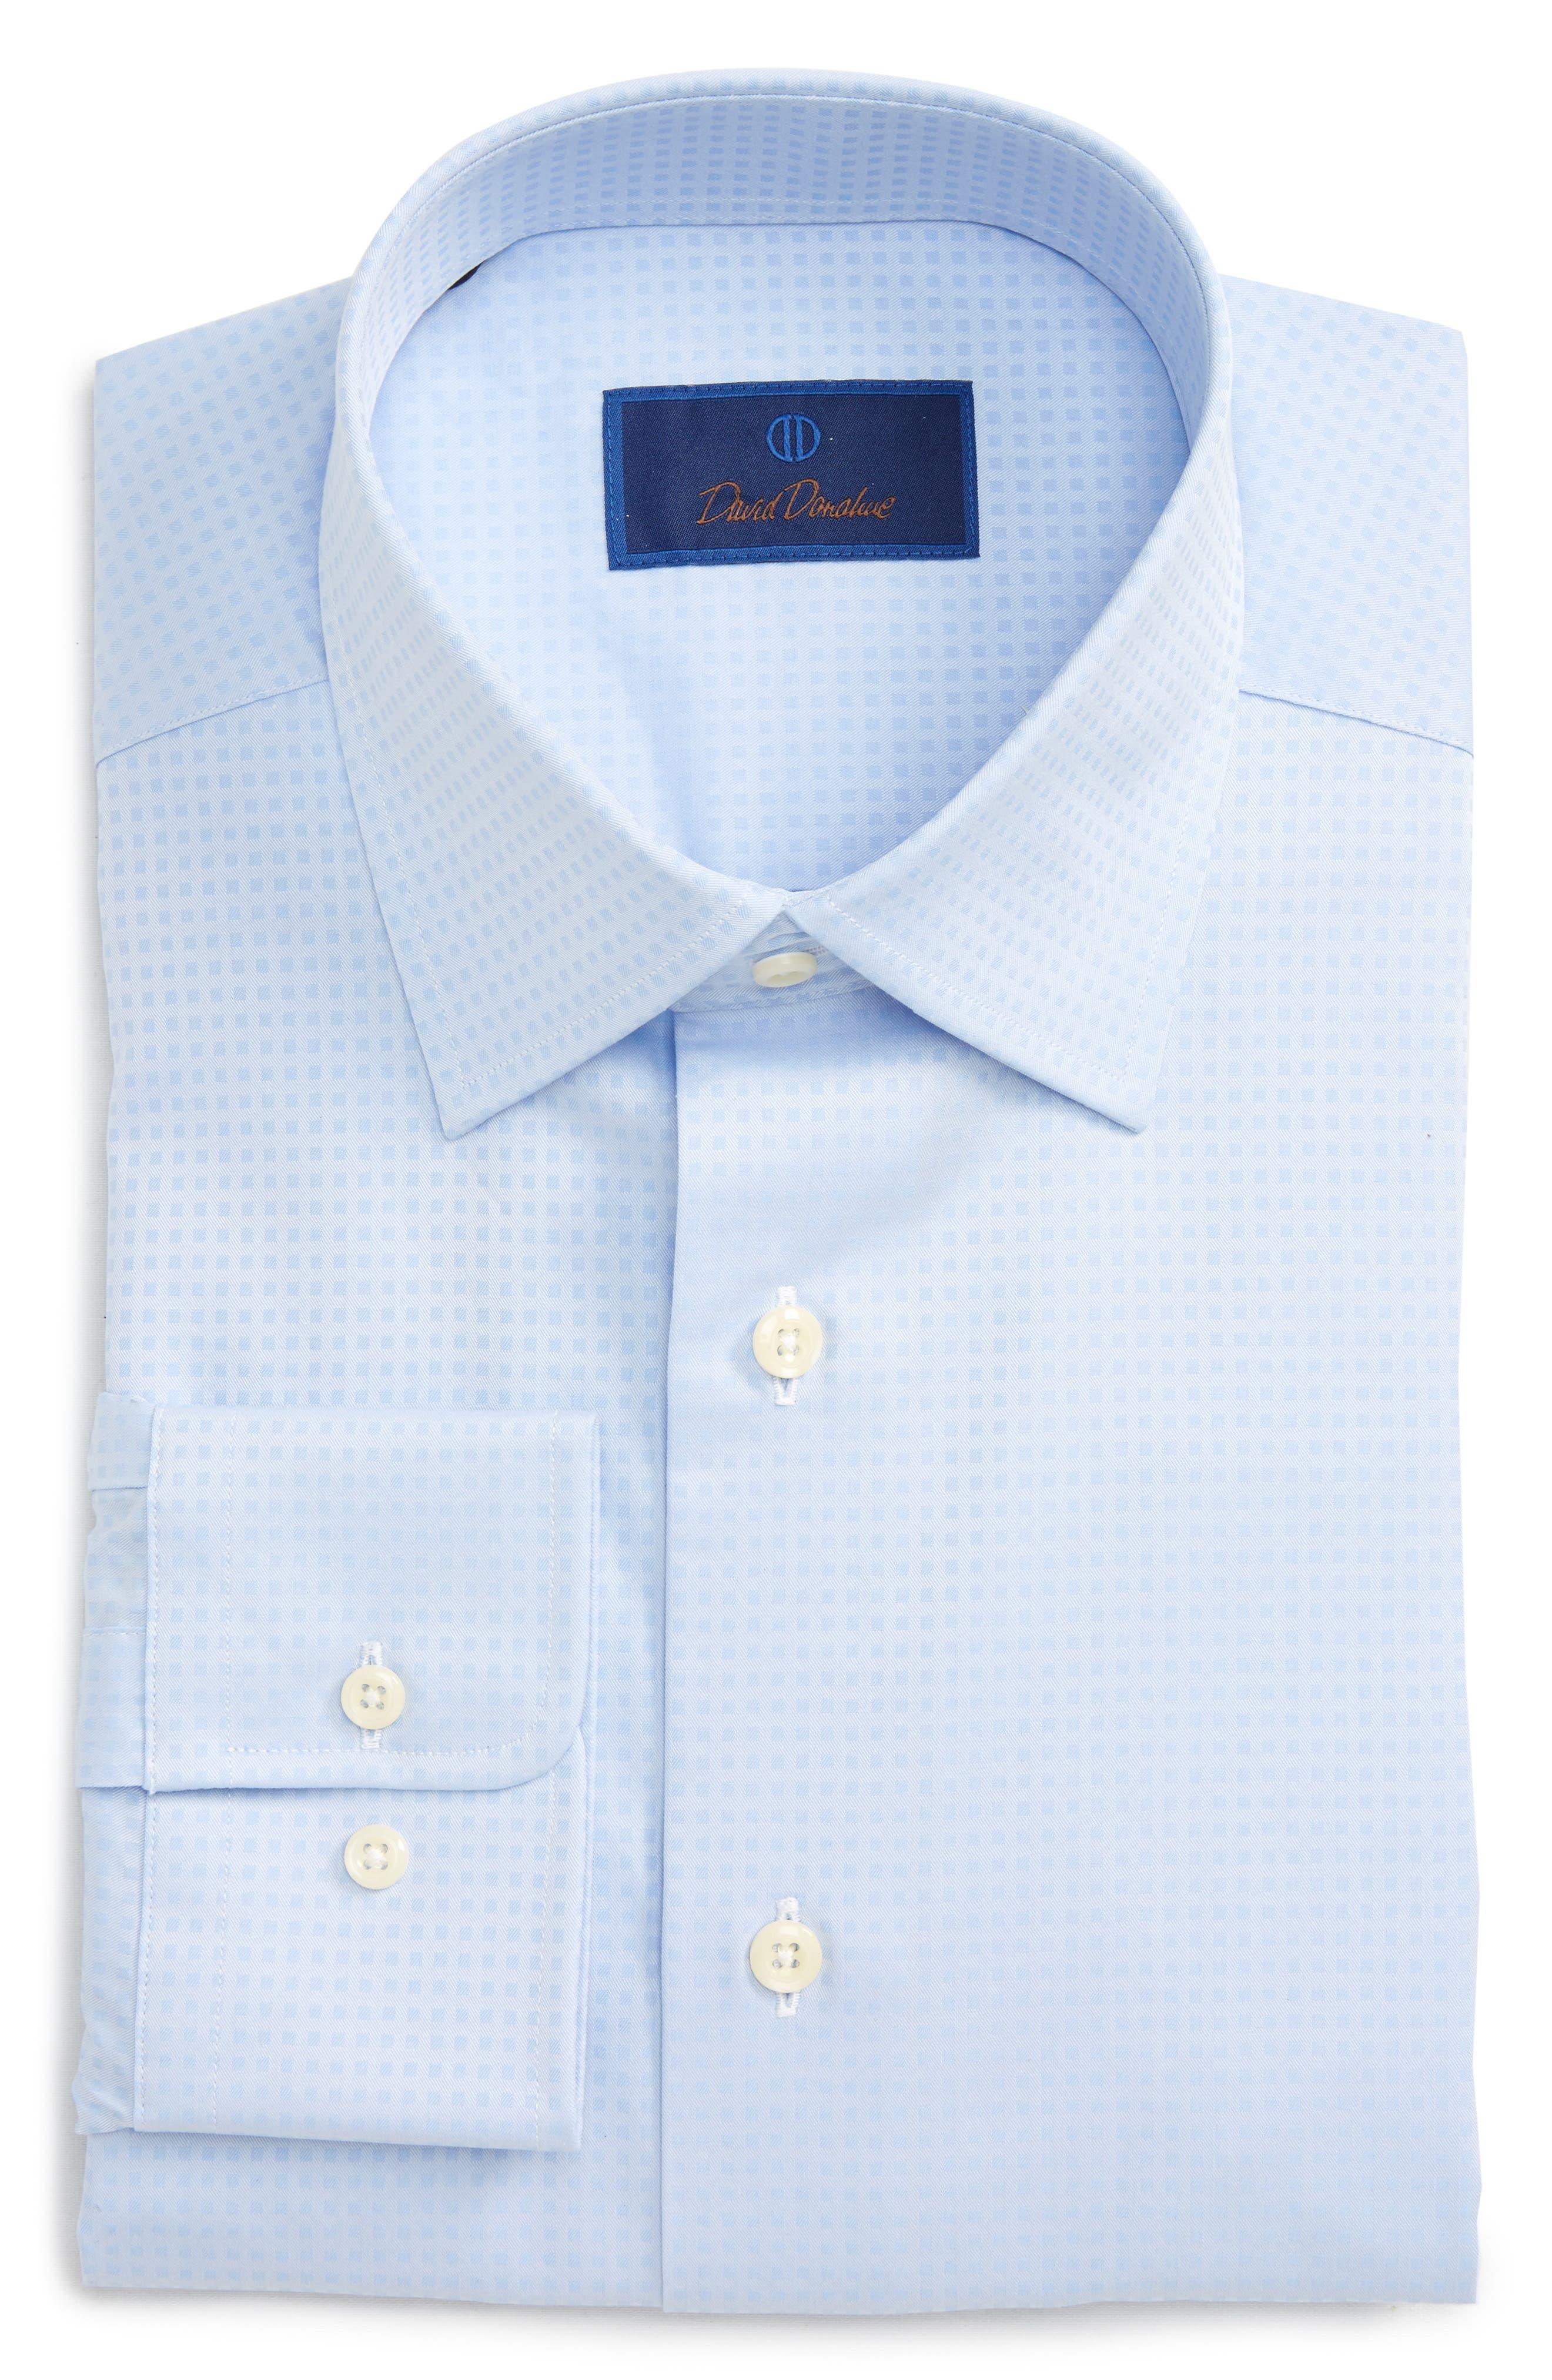 Regular Fit Check Dress Shirt,                         Main,                         color, 454